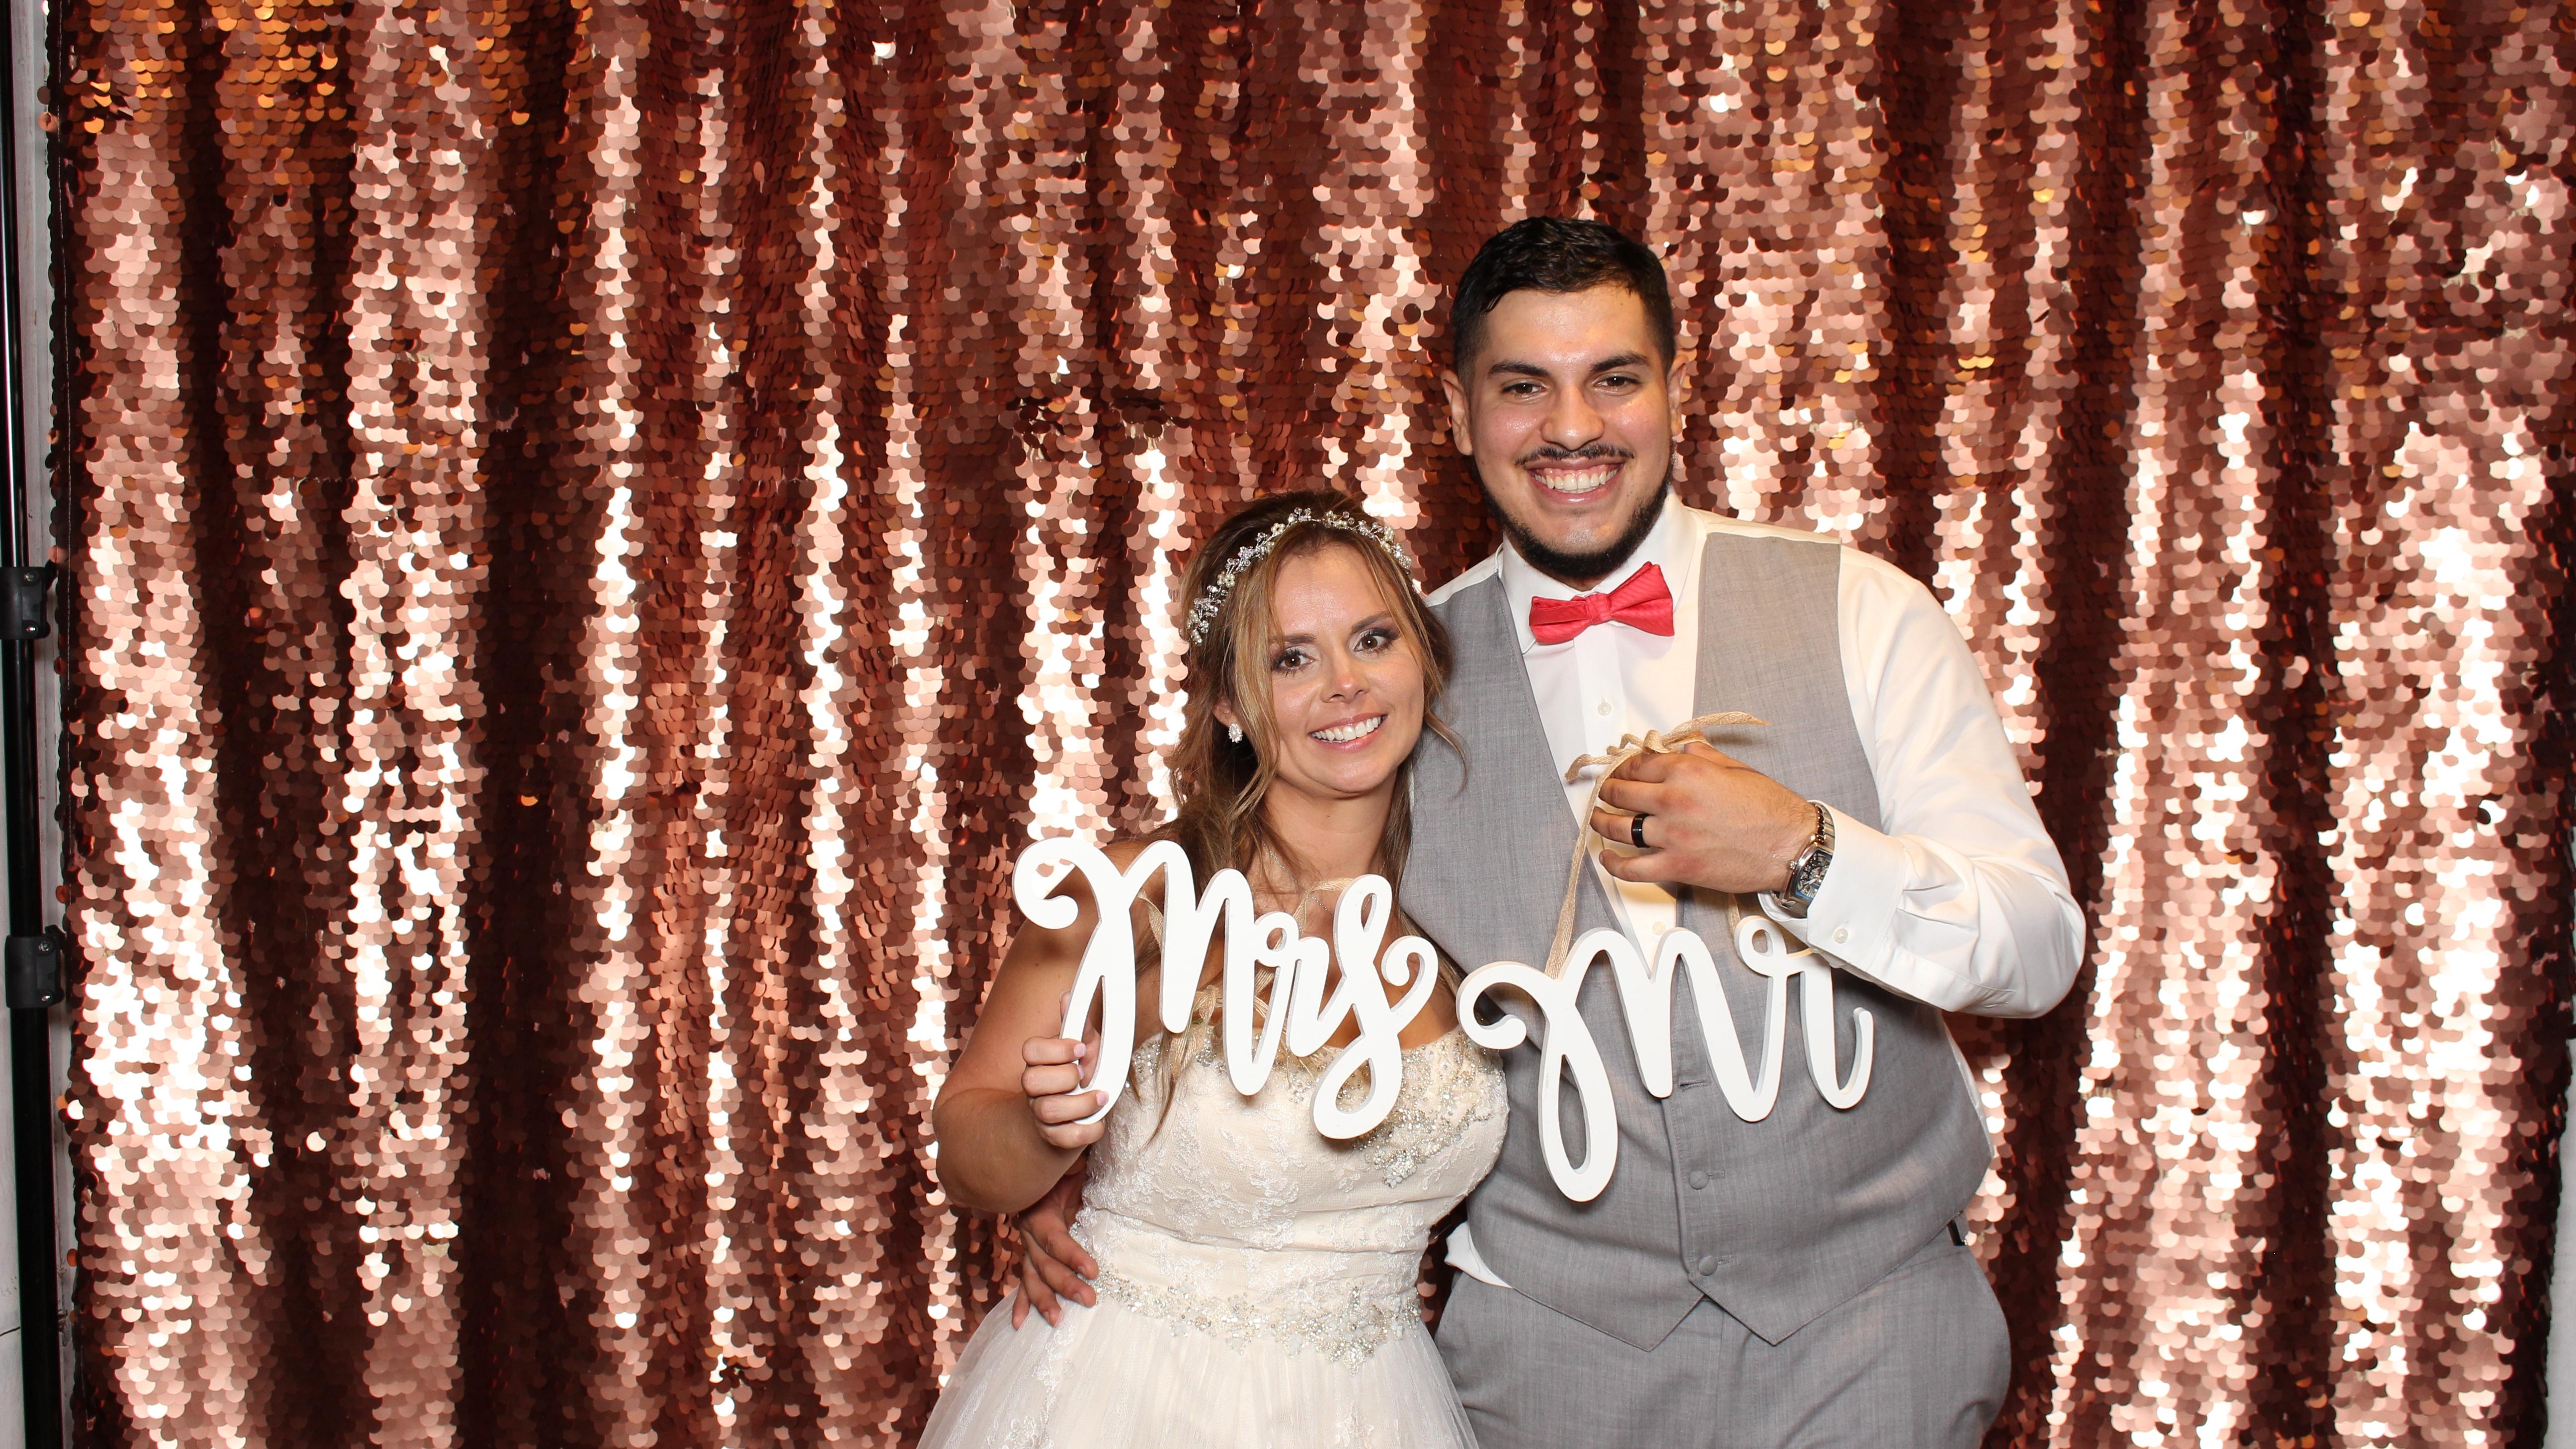 Wedding2018-09-15_19-51-51_1